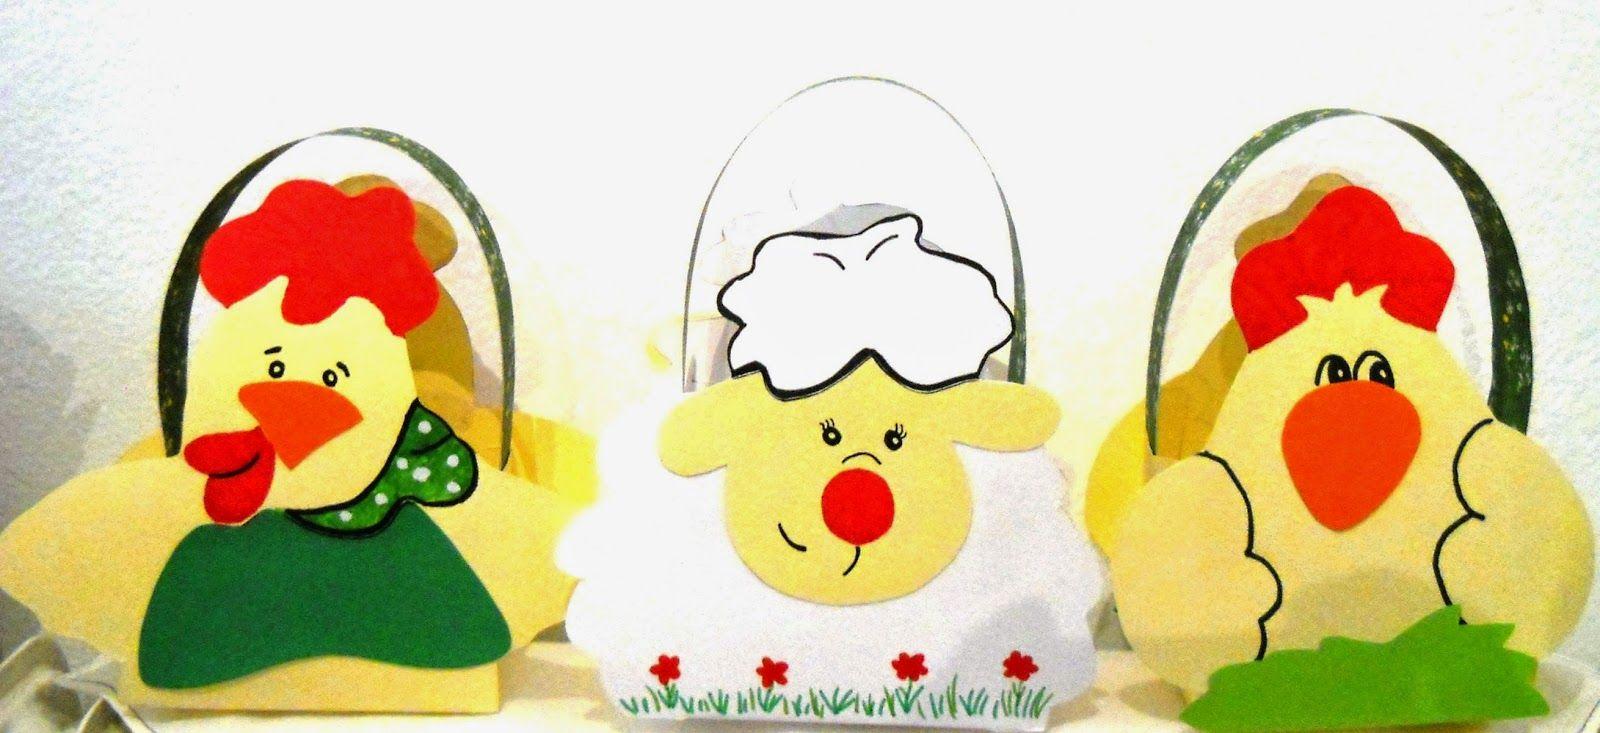 Pin by Barbara Tsoungou on Easter Sugar cookie, Blog